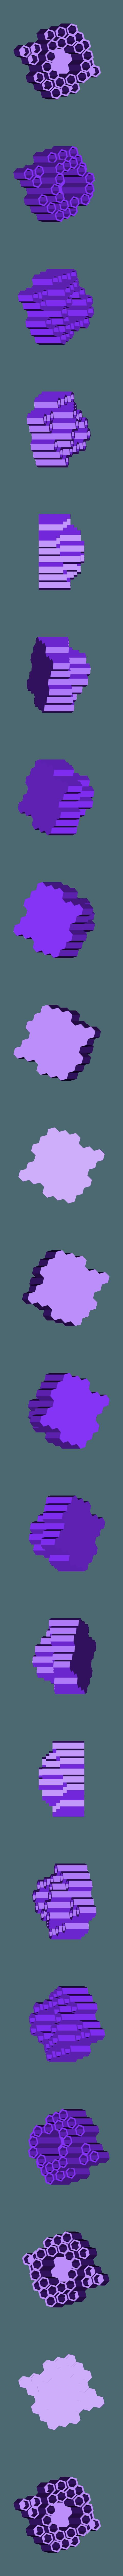 Honeycomb Cup.stl Download free STL file Honeycomb Cup • 3D print model, Terryyy